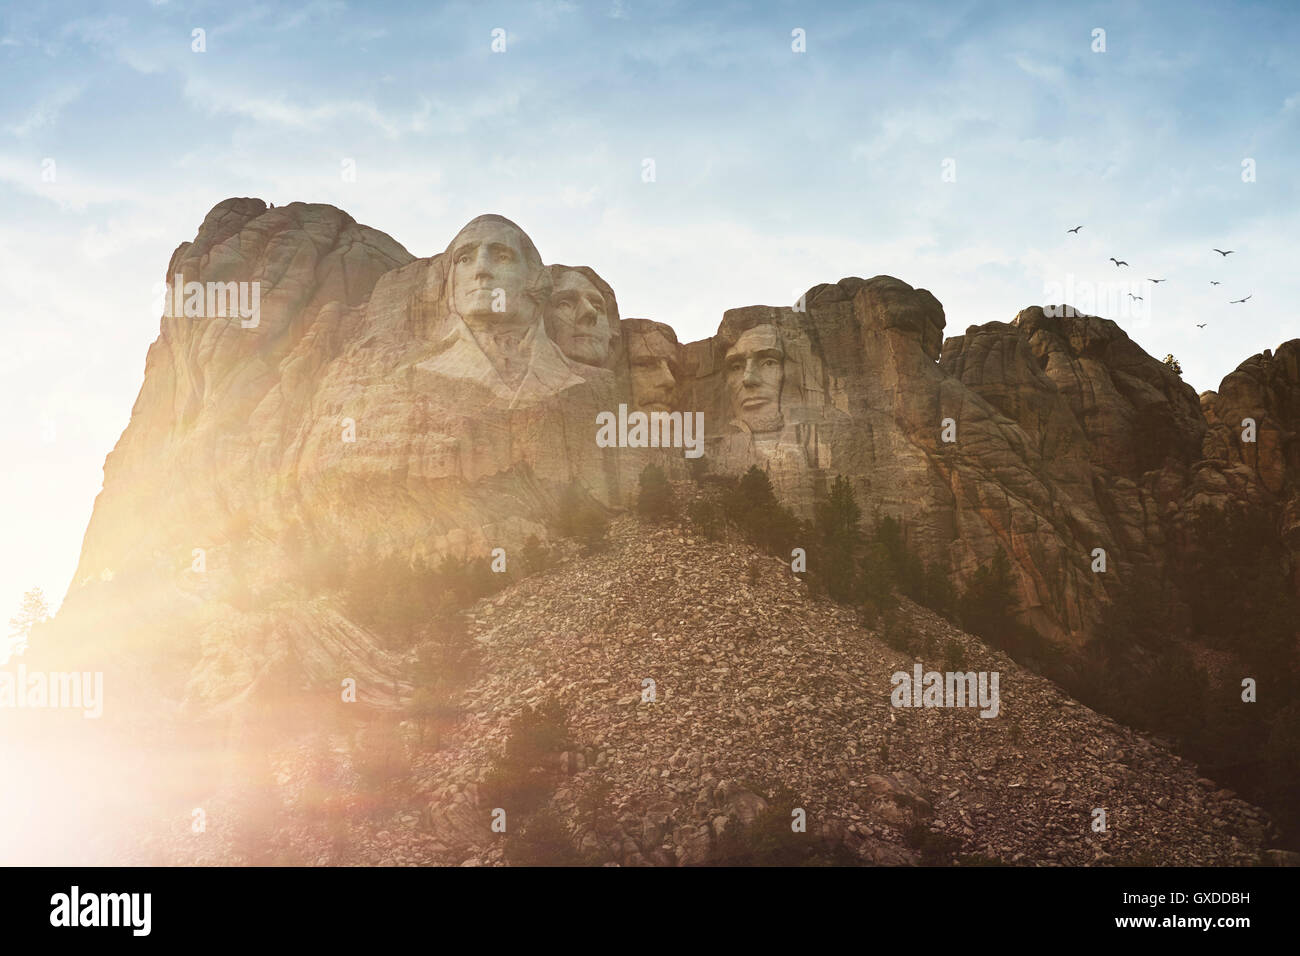 Sunlit view of Mount Rushmore, Keystone, South Dakota,  USA - Stock Image